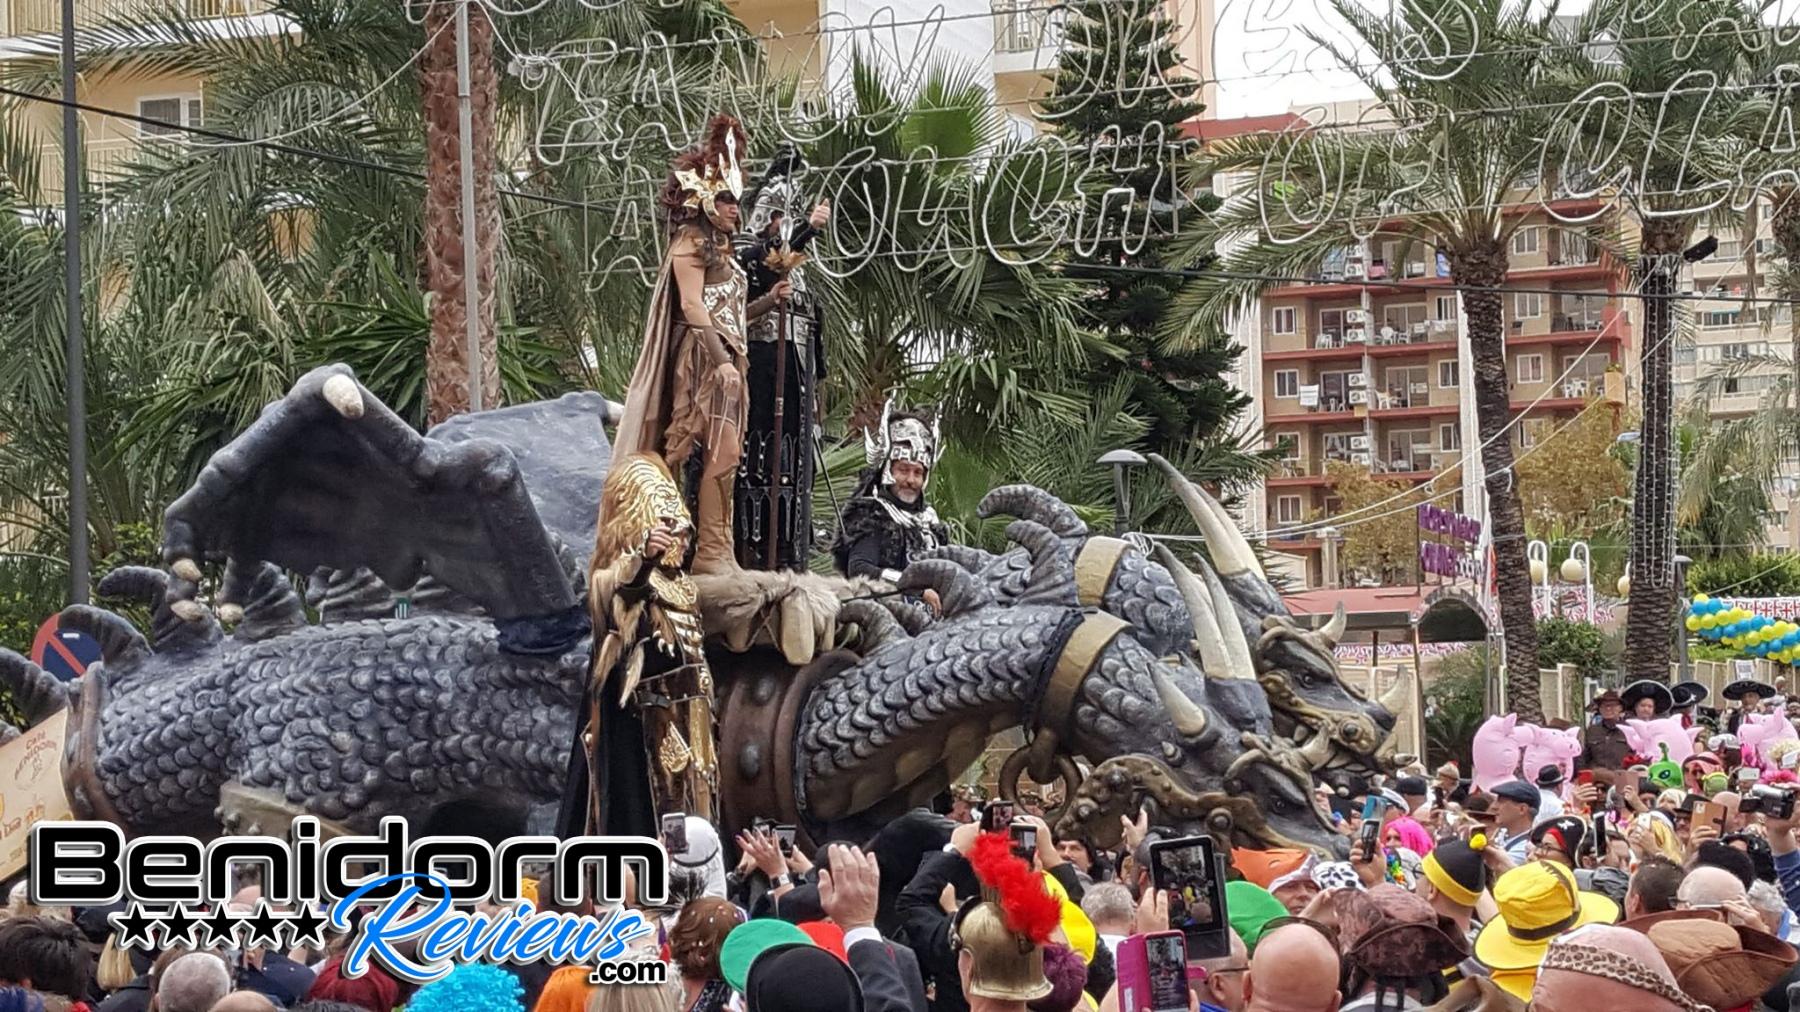 Benidorm-Fiestas-2019-Fancy-Dress-15